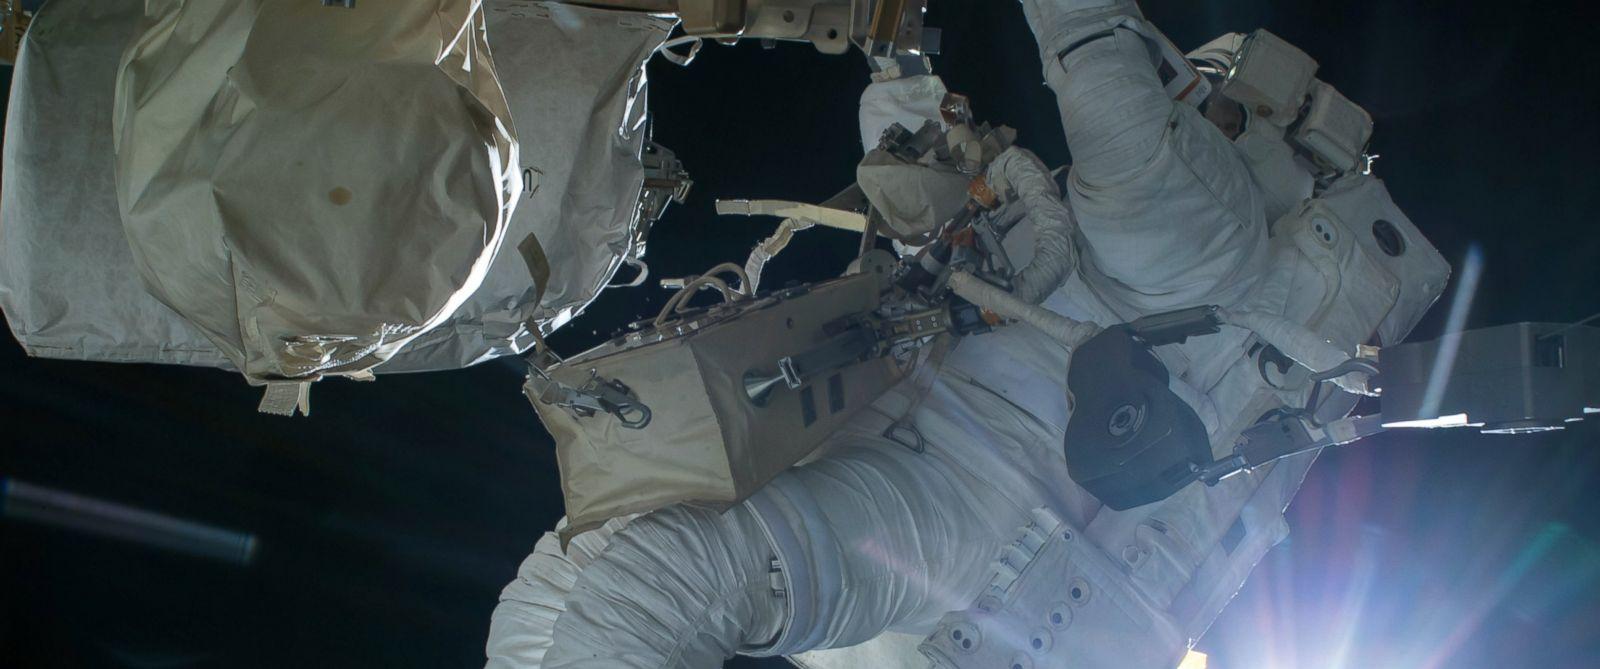 PHOTO: Astronaut Terry Virts conducts a spacewalk during an orbital sunrise on Feb. 21, 2015.